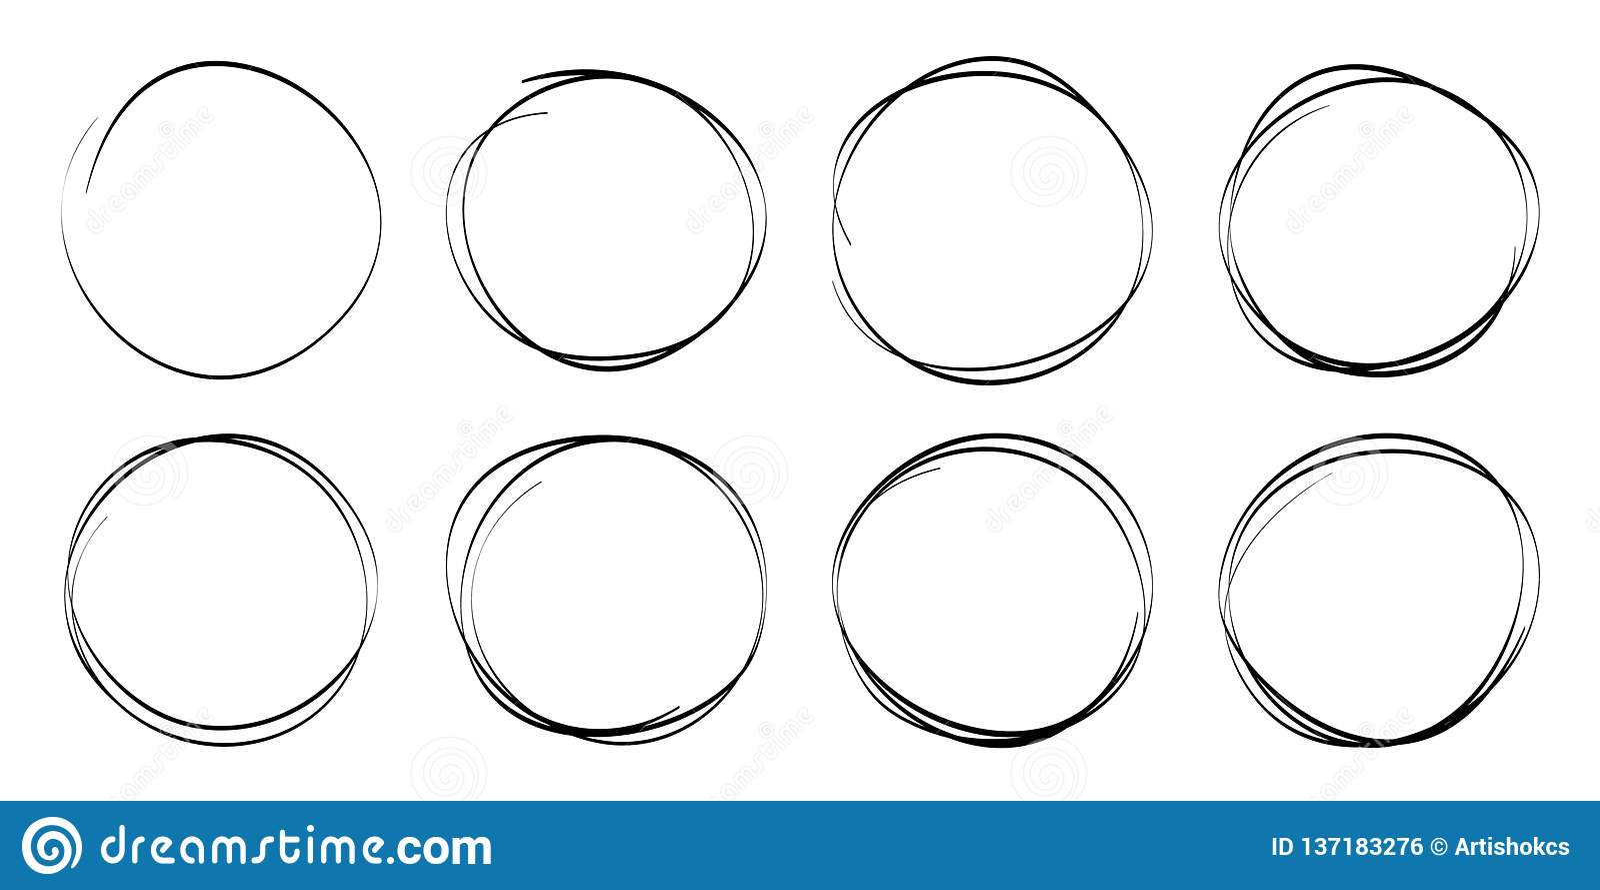 Hand drawn circles sketch frame set. Rounds scribble line circles. Doodle circular logo design elements. Vector